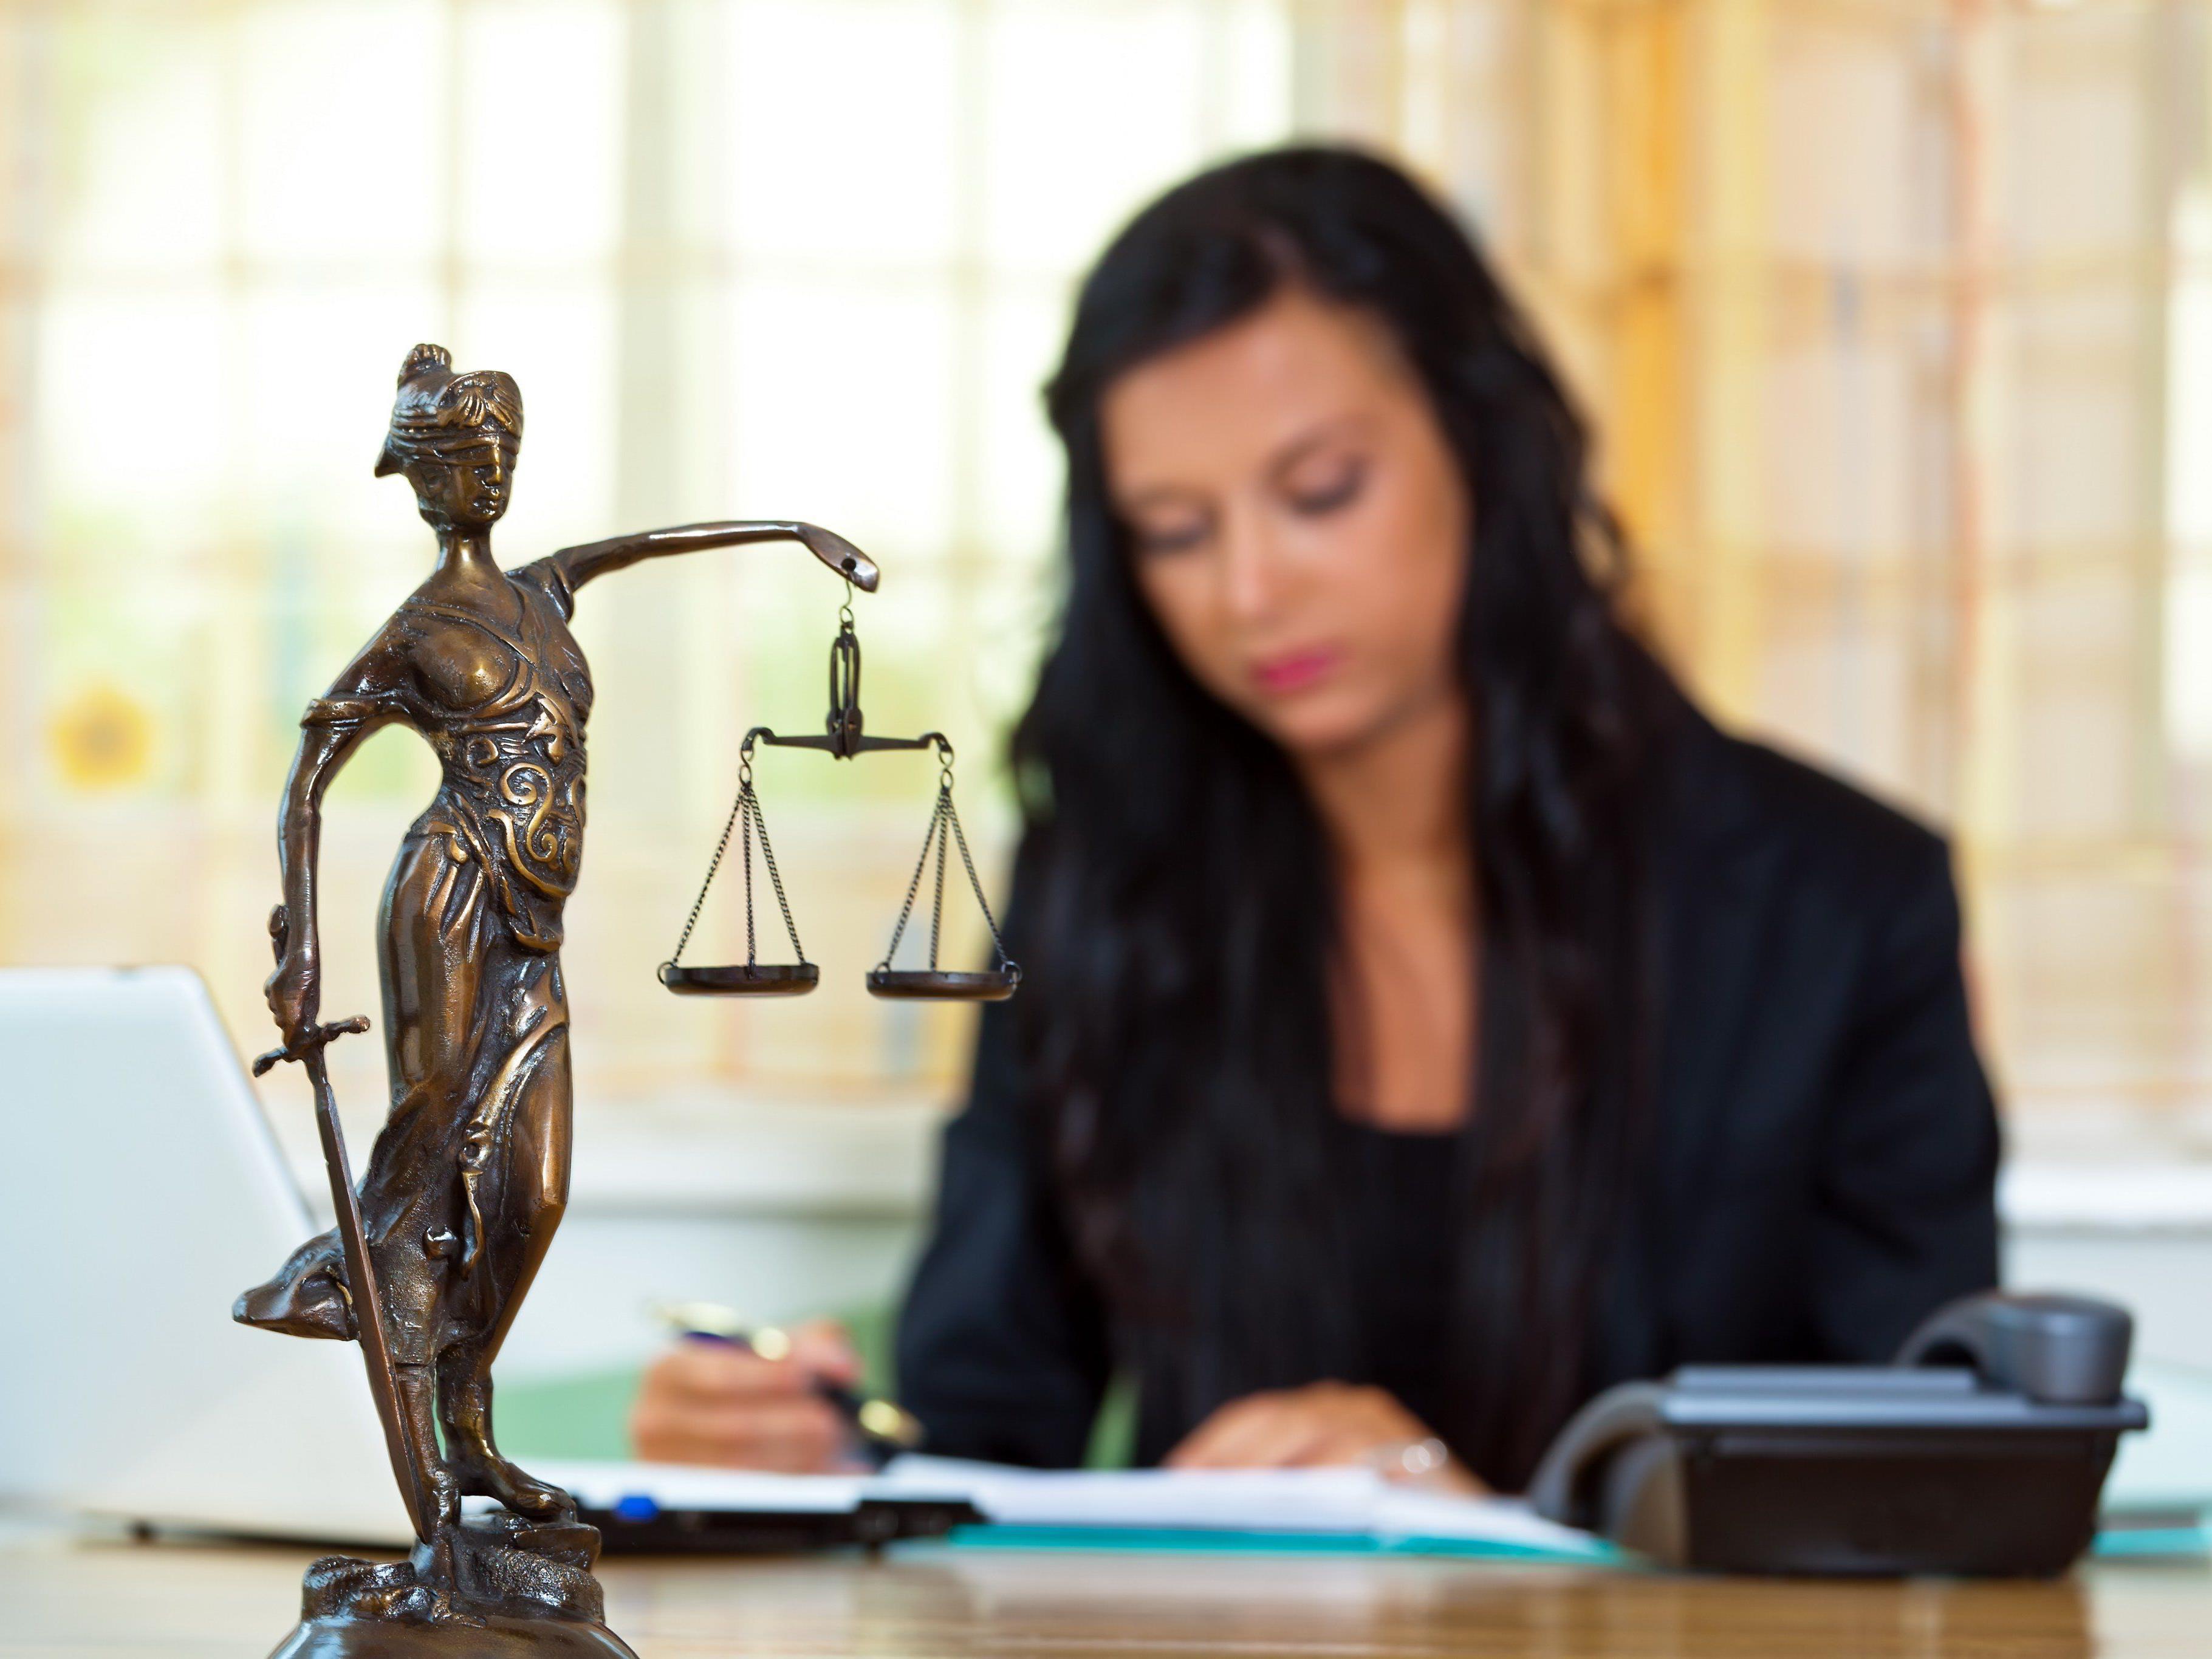 Rechtswissenschaften sind bei vielen jungen Menschen angesagt.